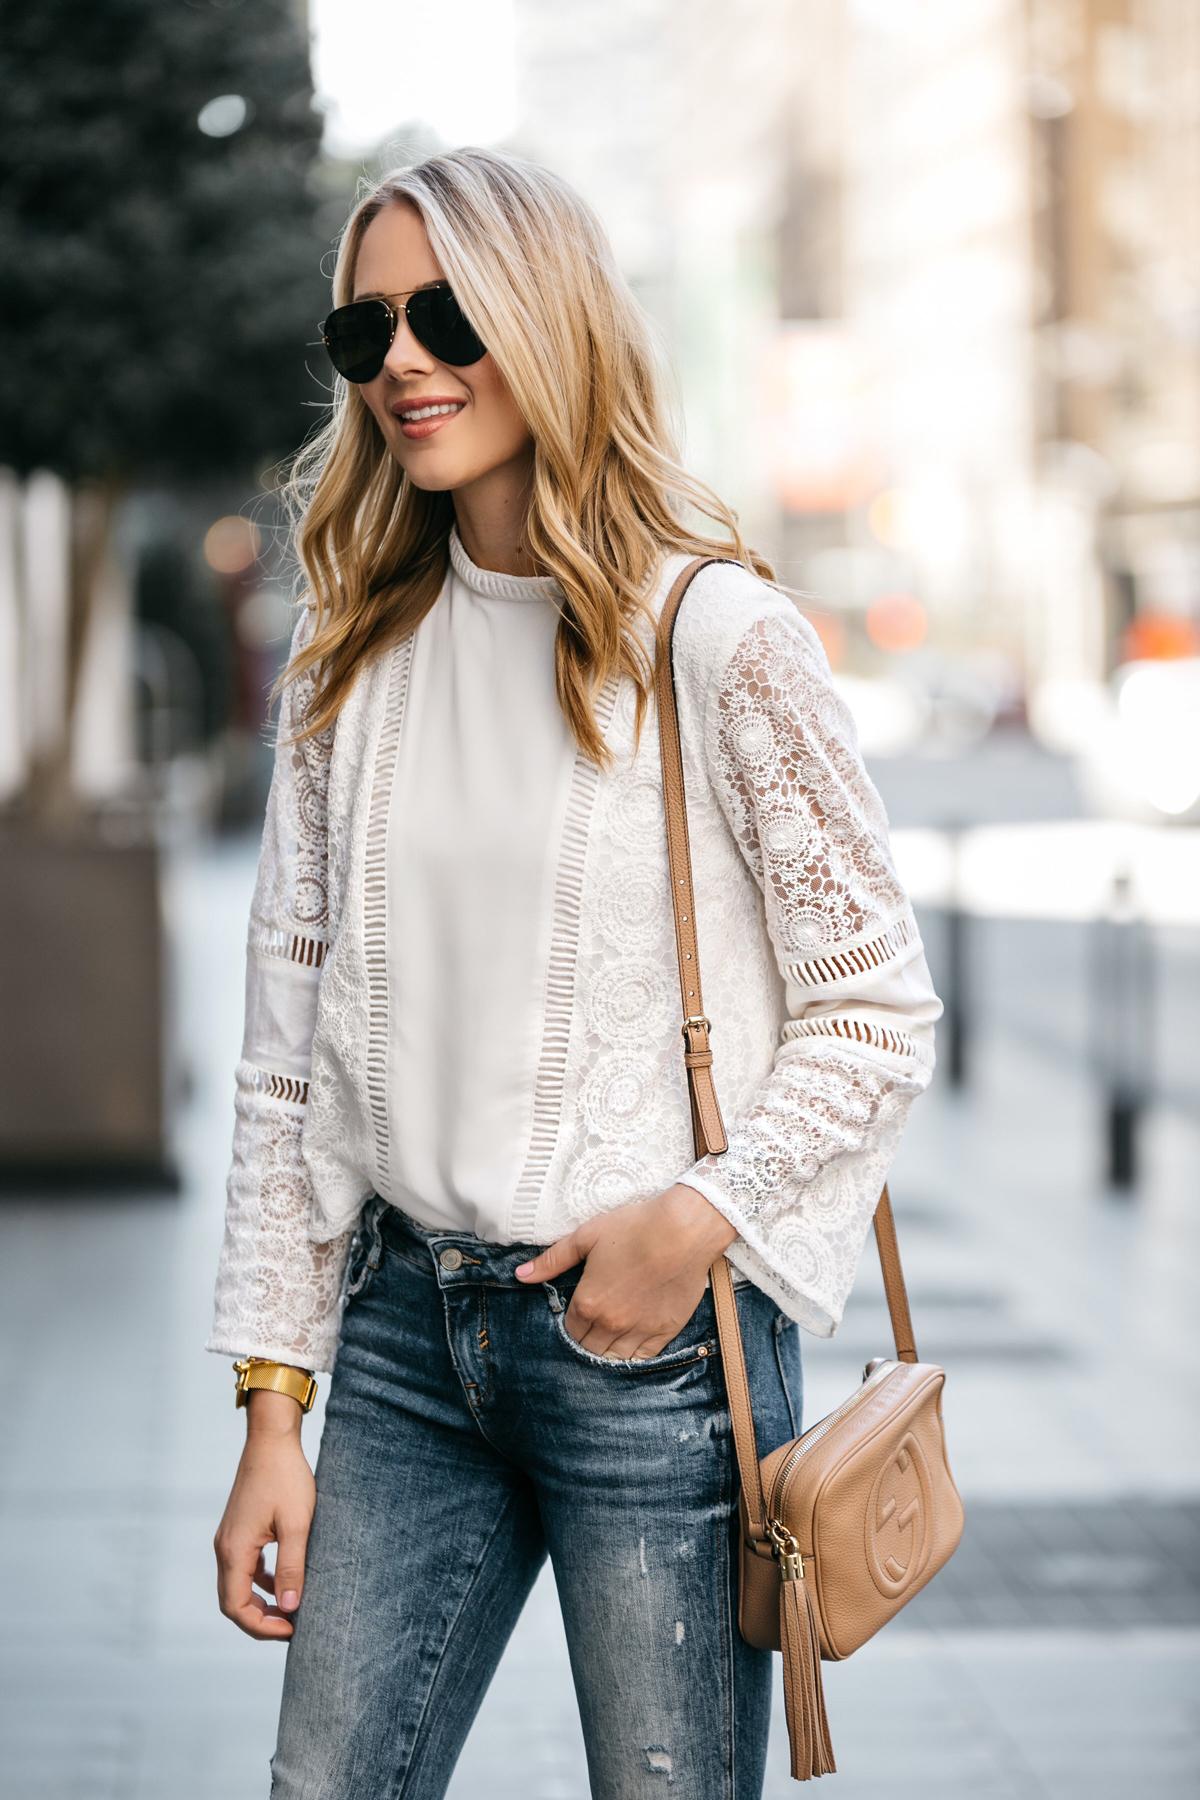 Fashion Jackson, Dallas Blogger, Fashion Blogger, Street Style, Mink Pink White Lace Top, Zara Denim Ripped Skinny Jeans, Gucci Soho Disco Handbag